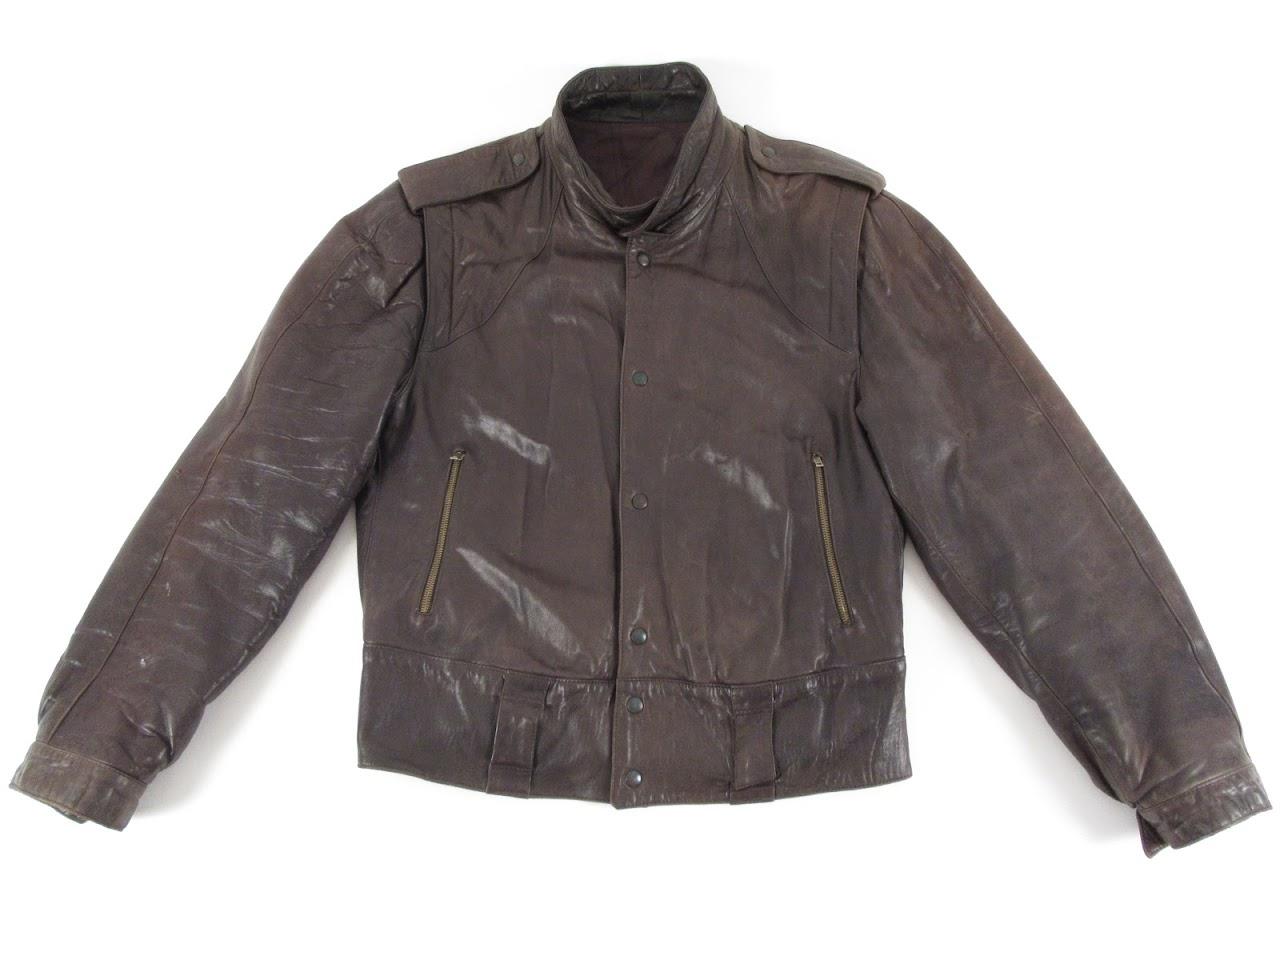 Vintage Girgio Armani 80's  Style Leather Jacket